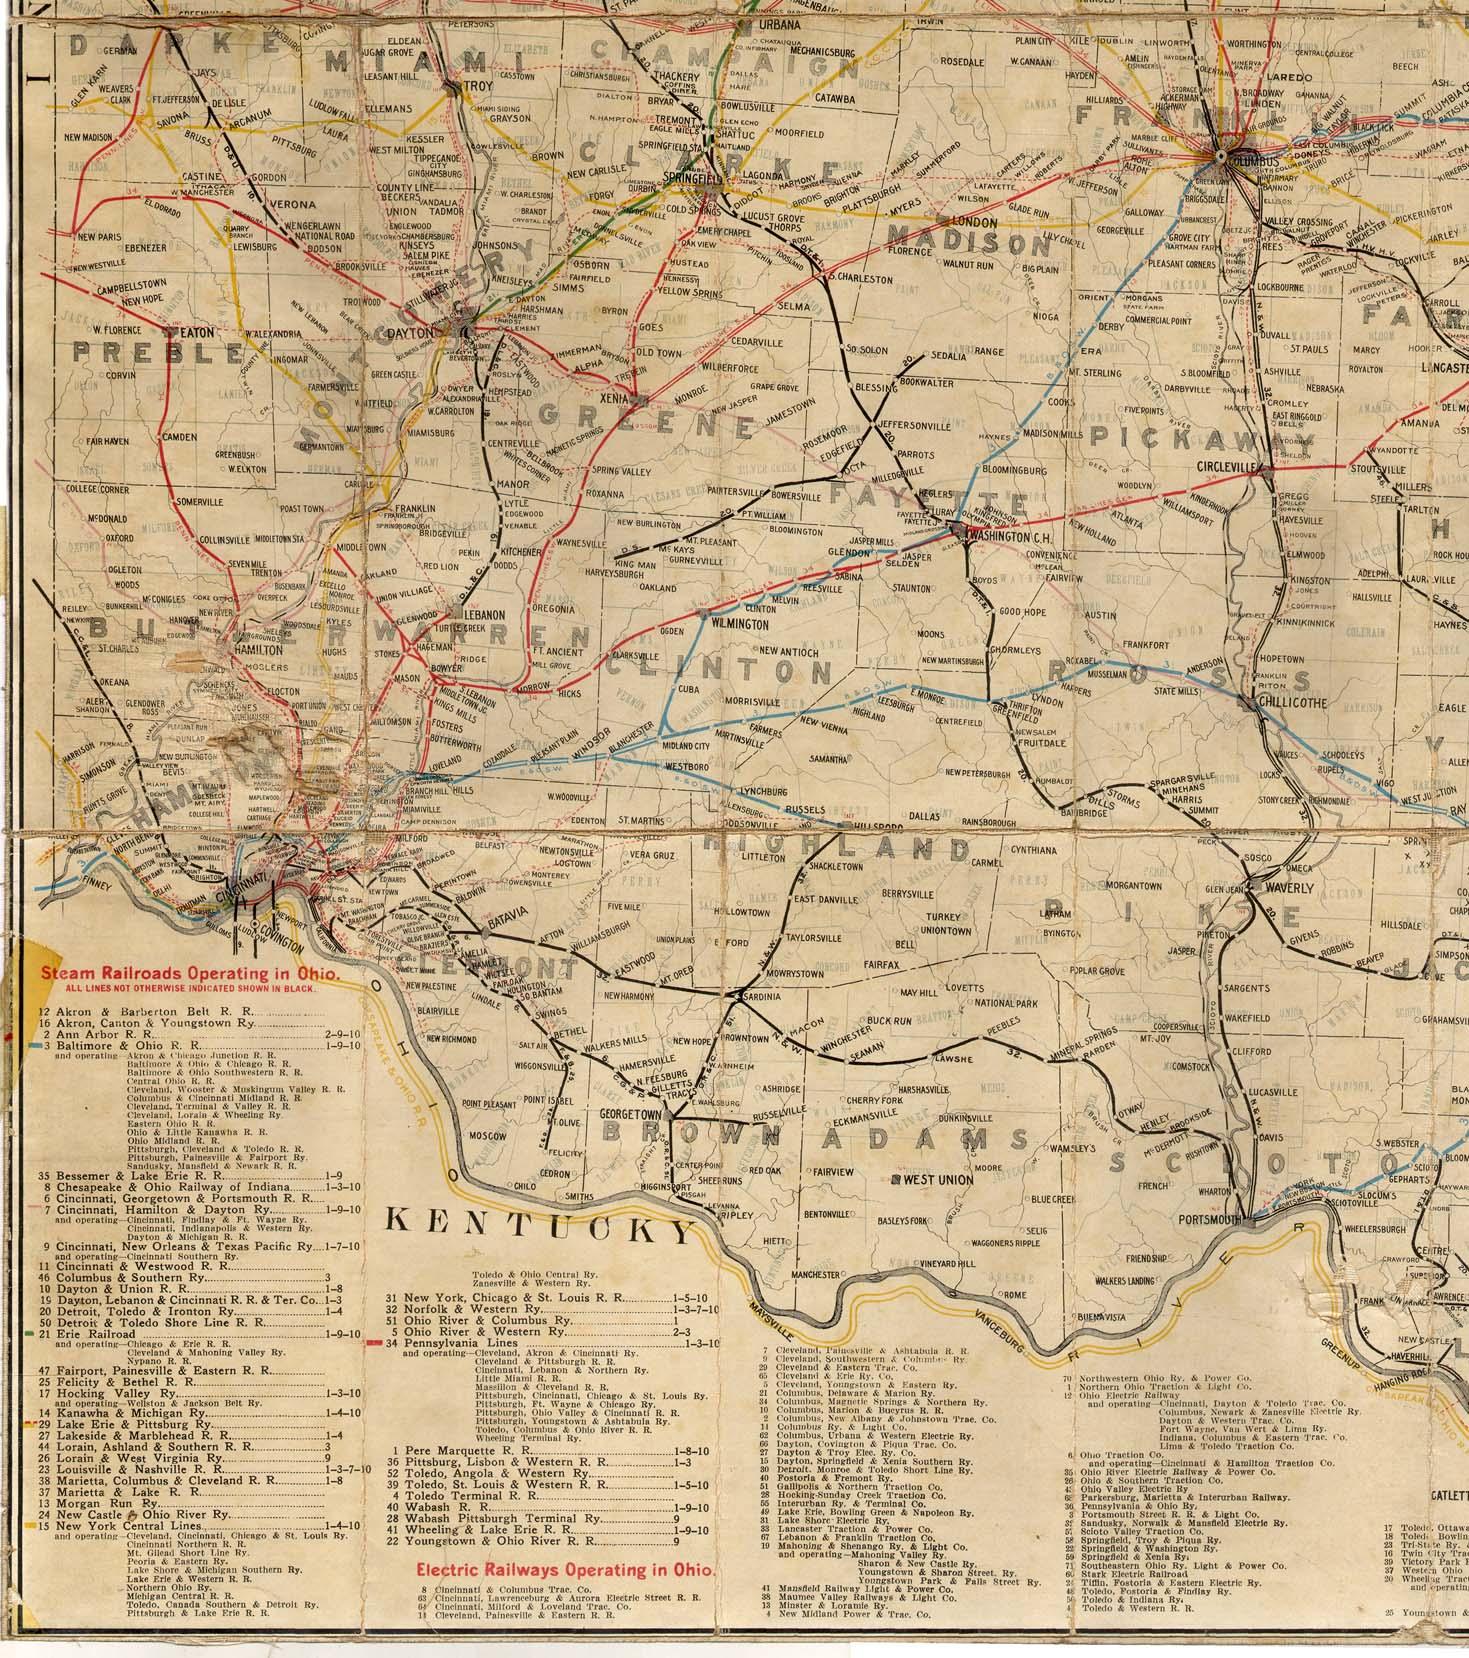 1914 Railroad Map of Ohio